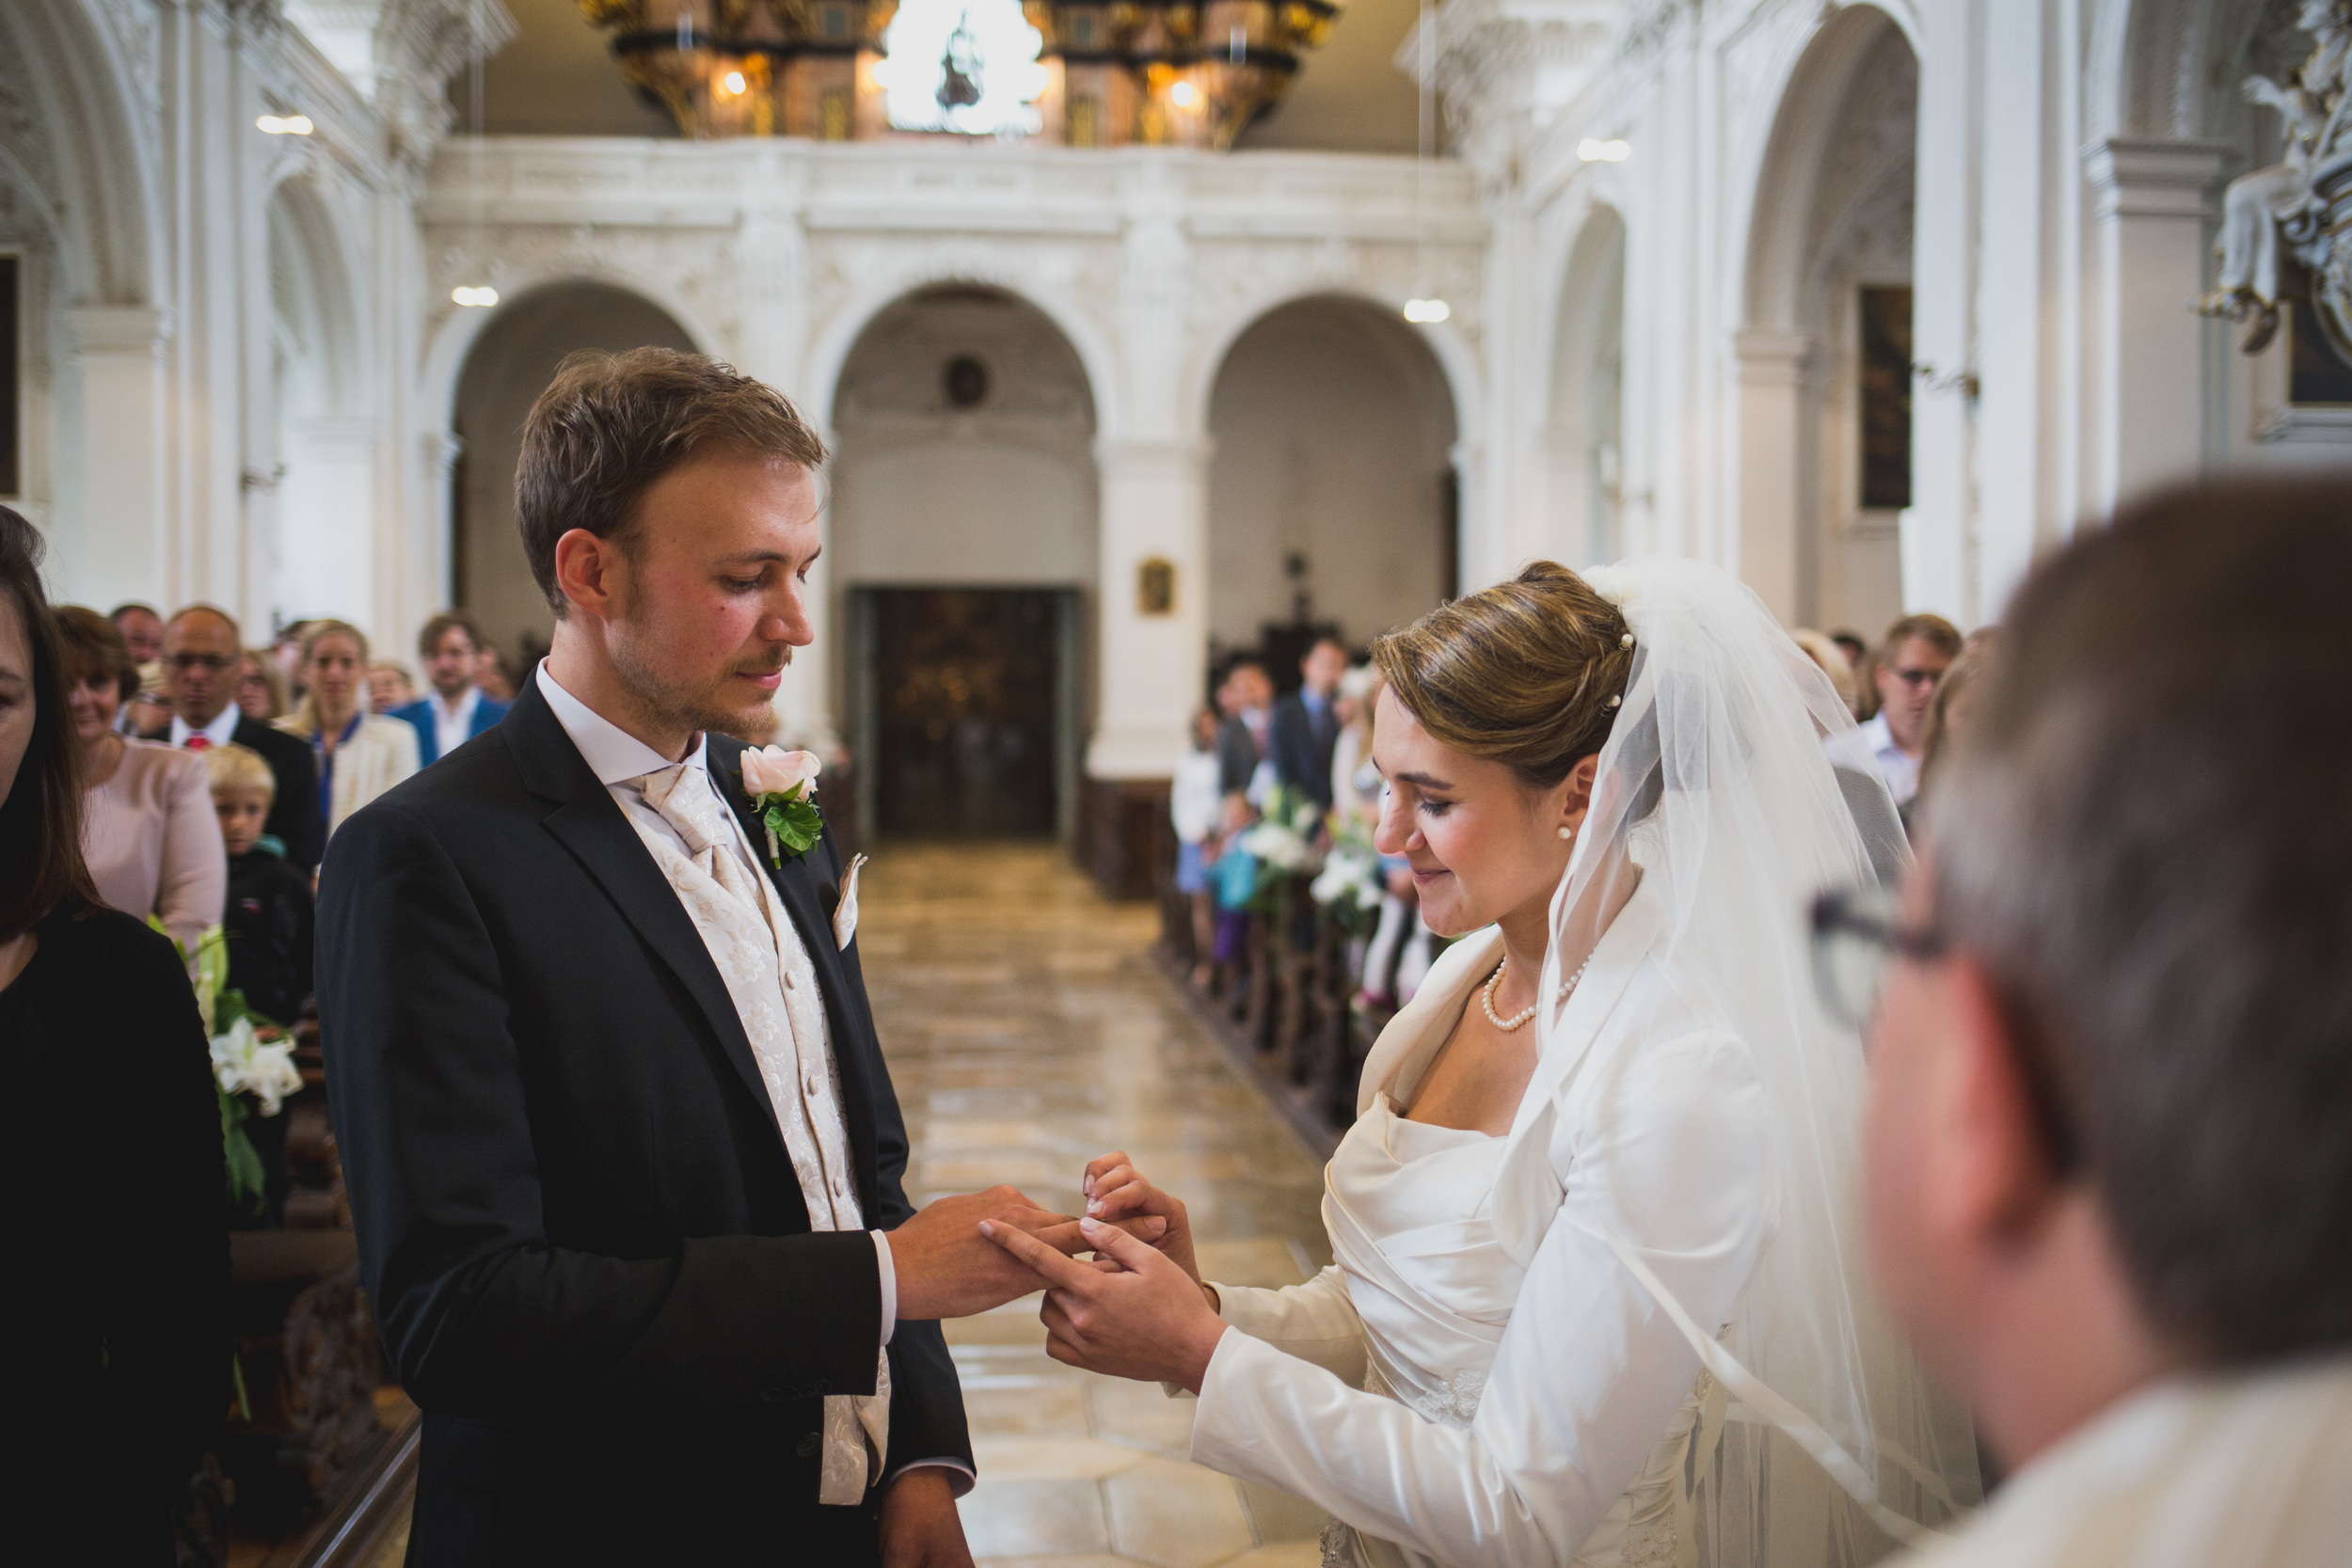 Pauline-Und-Christoph-Buffalo-NY-Wedding-by-Stefan-Ludwig-Photography-330.jpg